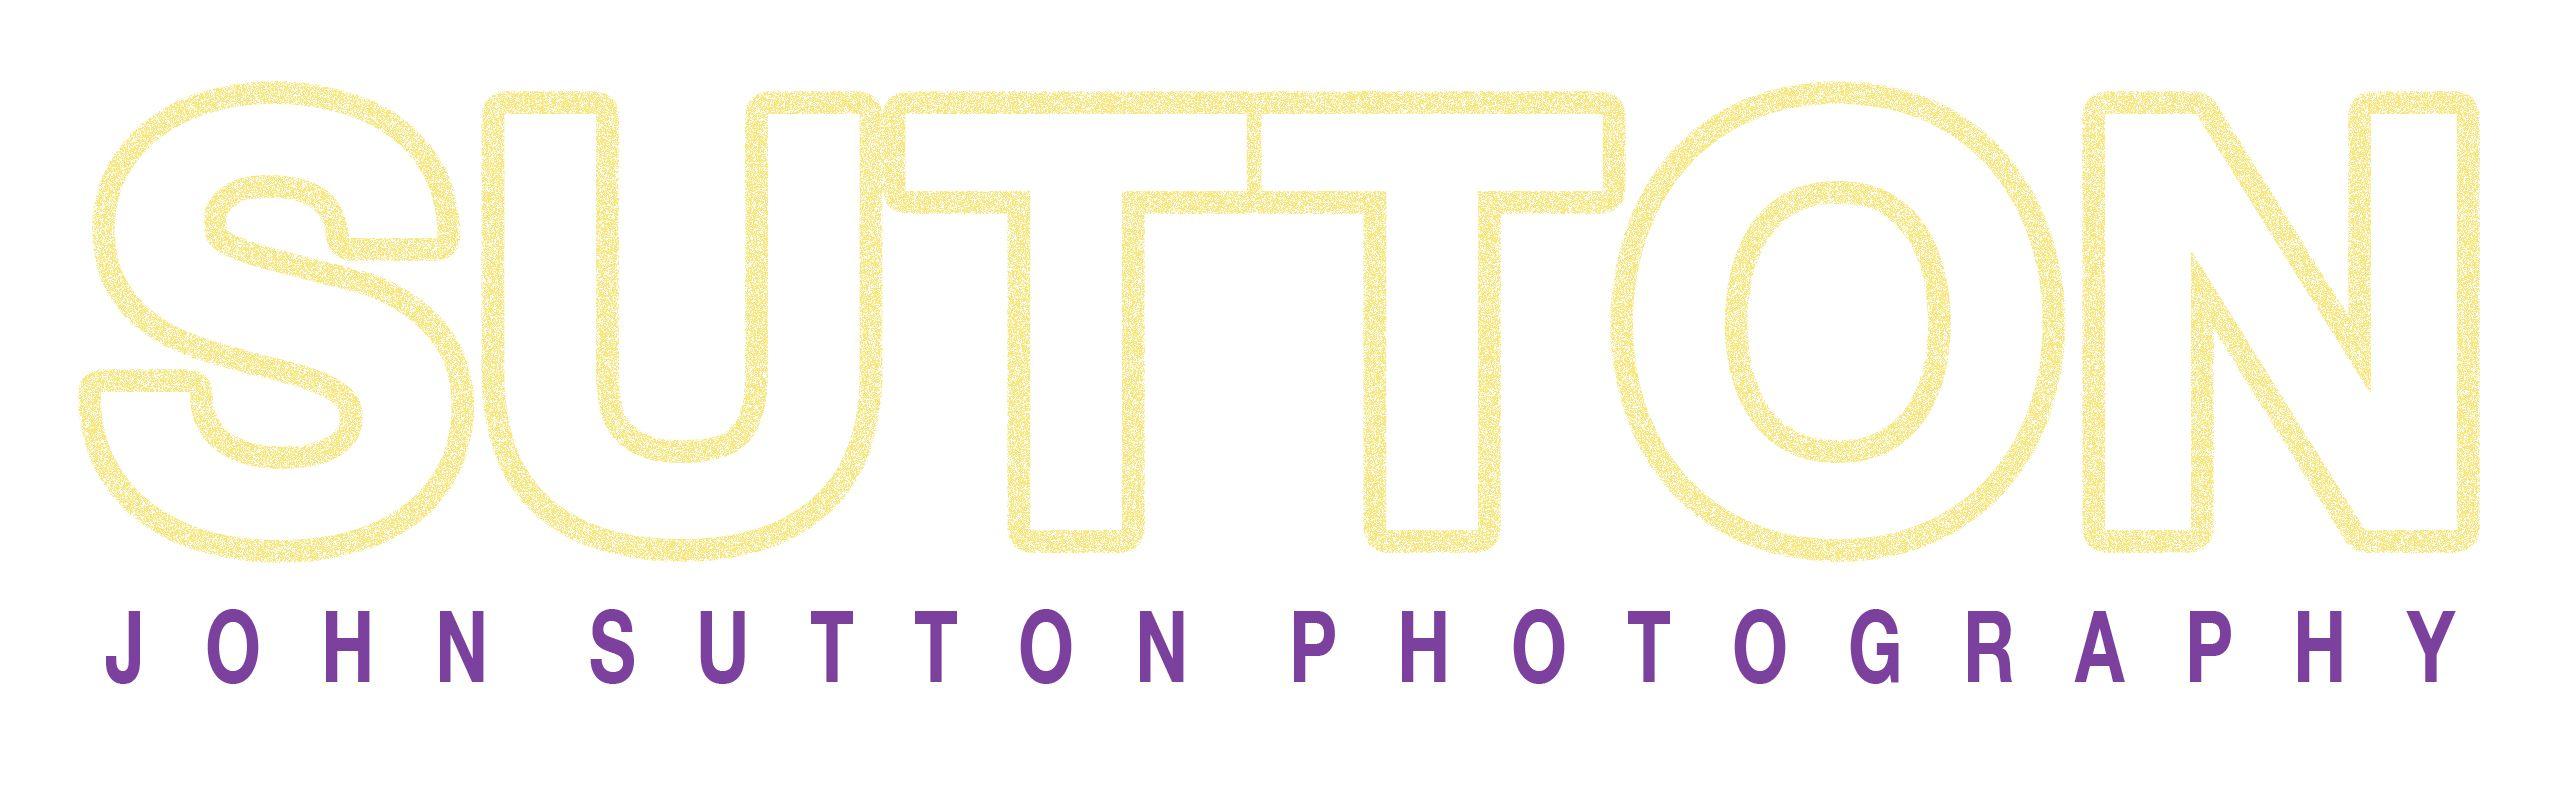 John Sutton Photography